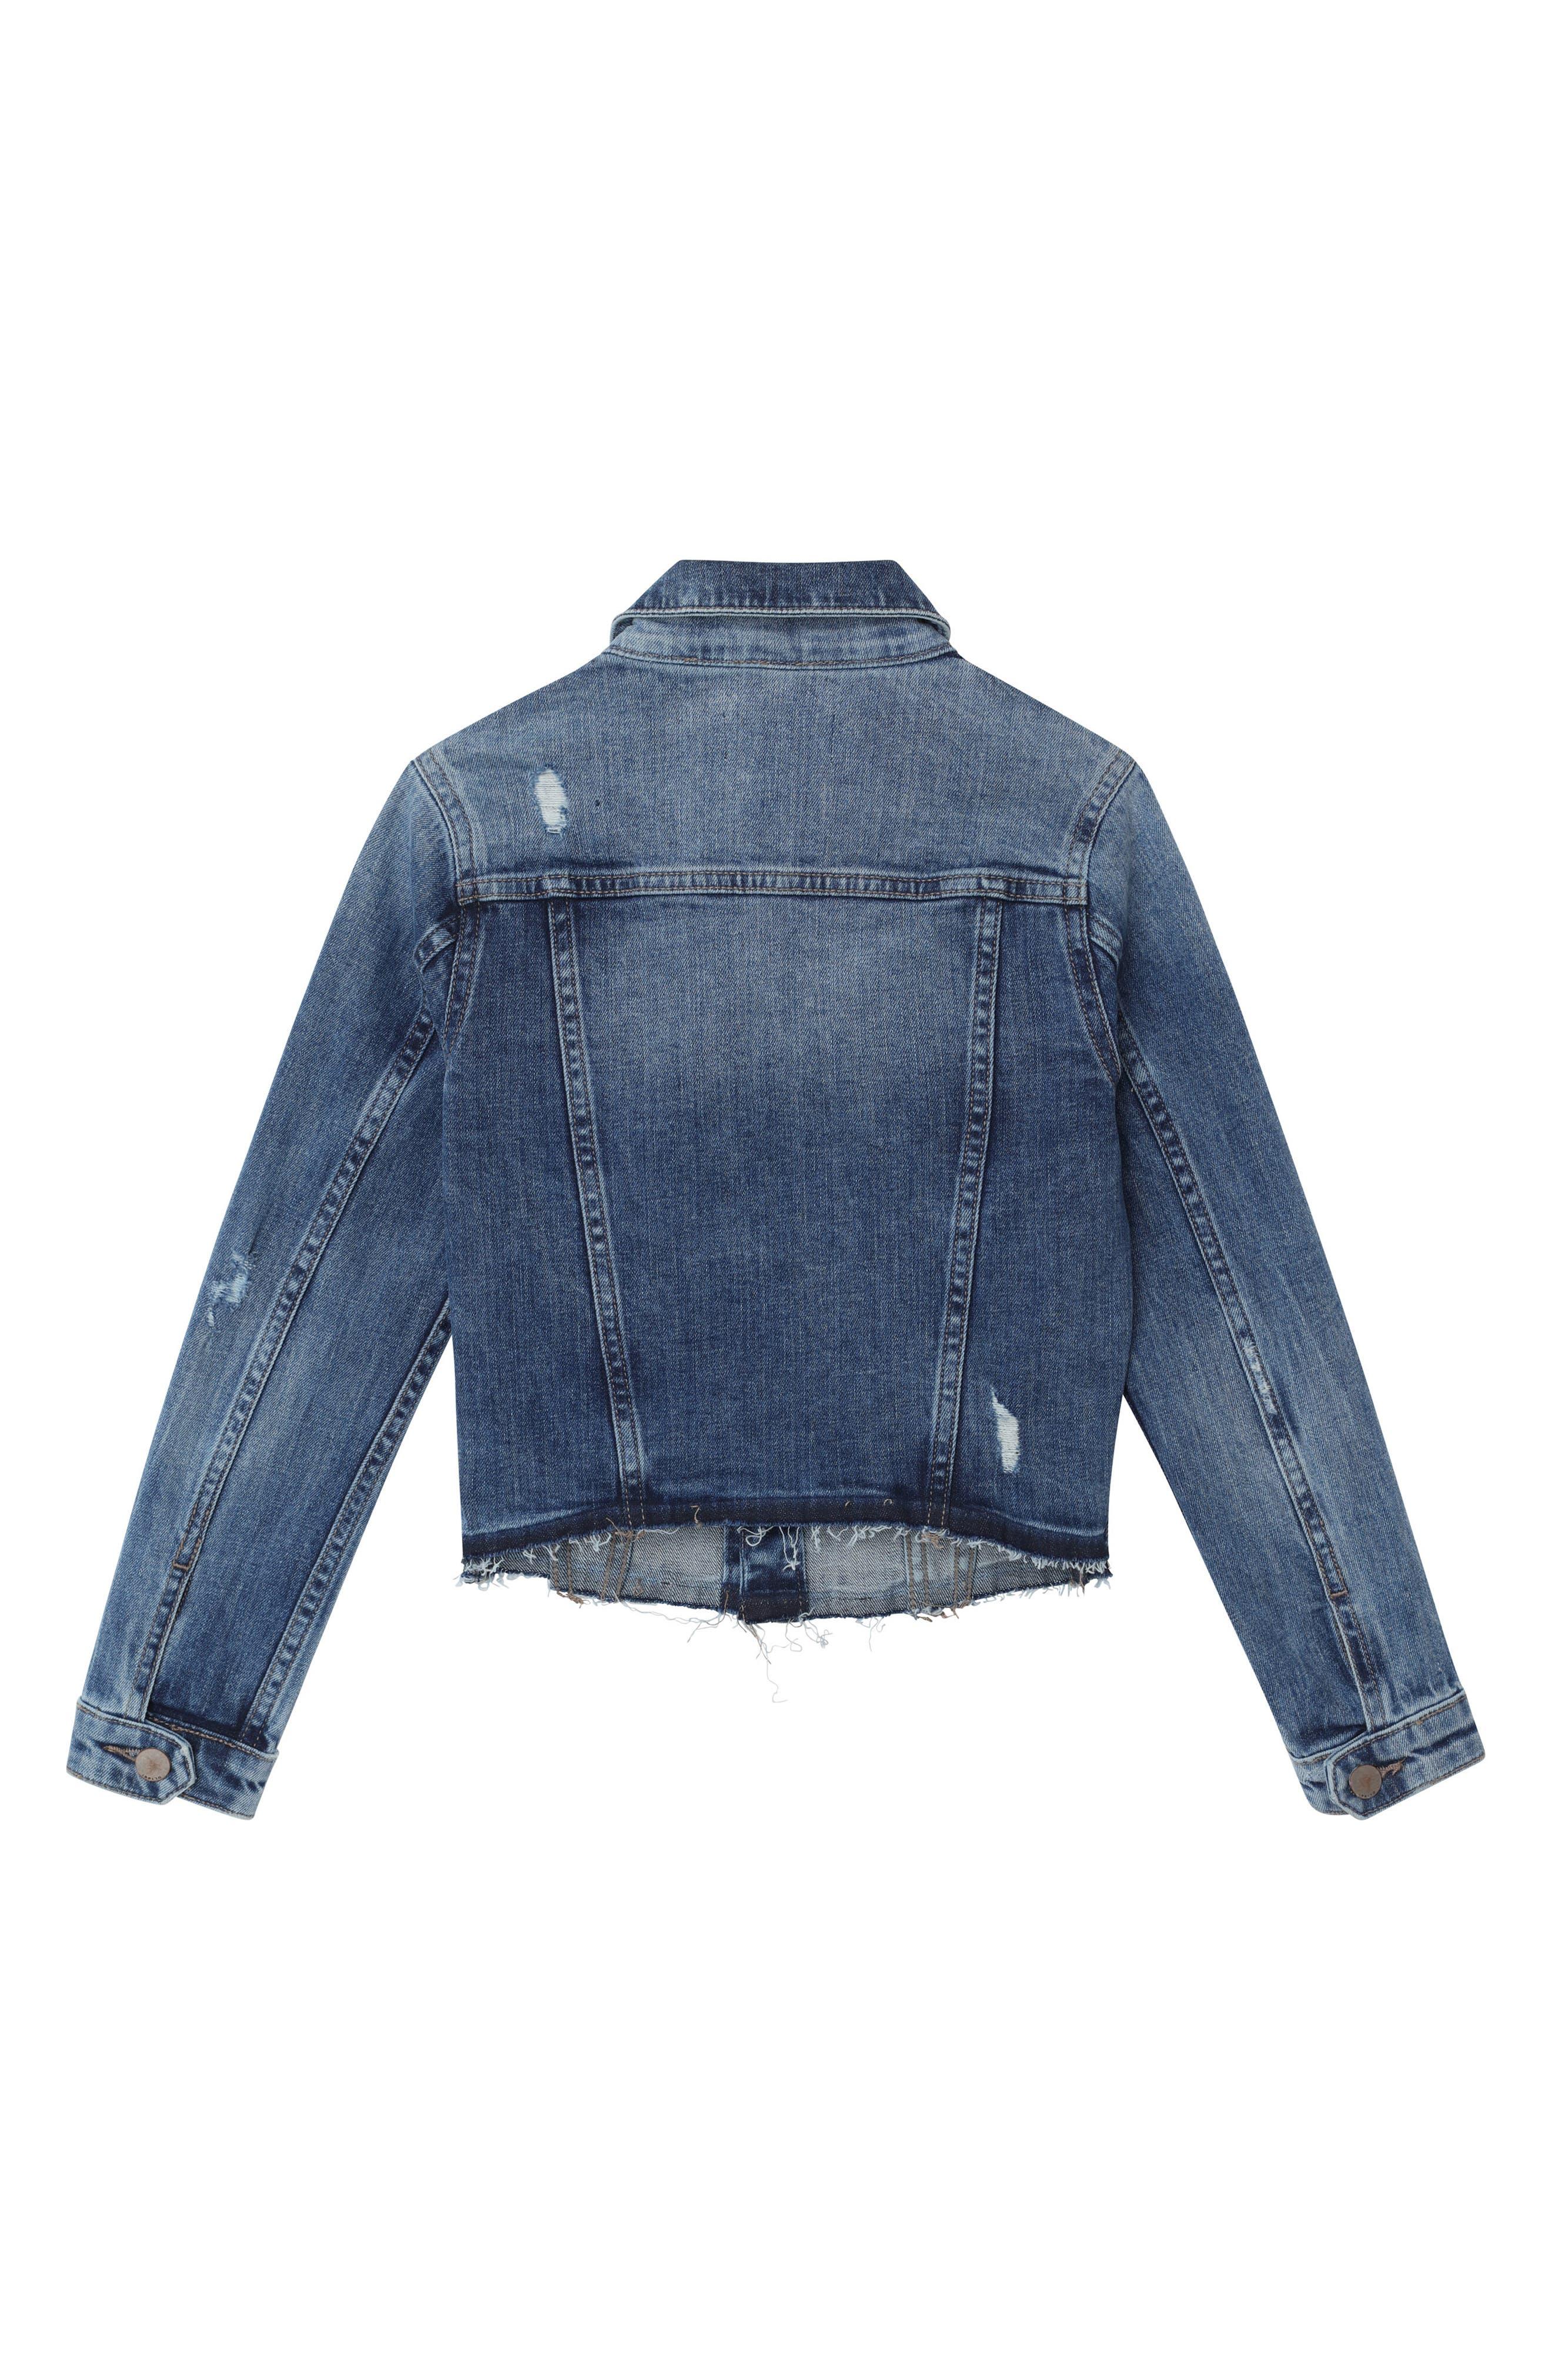 Distressed Denim Jacket,                             Alternate thumbnail 2, color,                             CLOUD